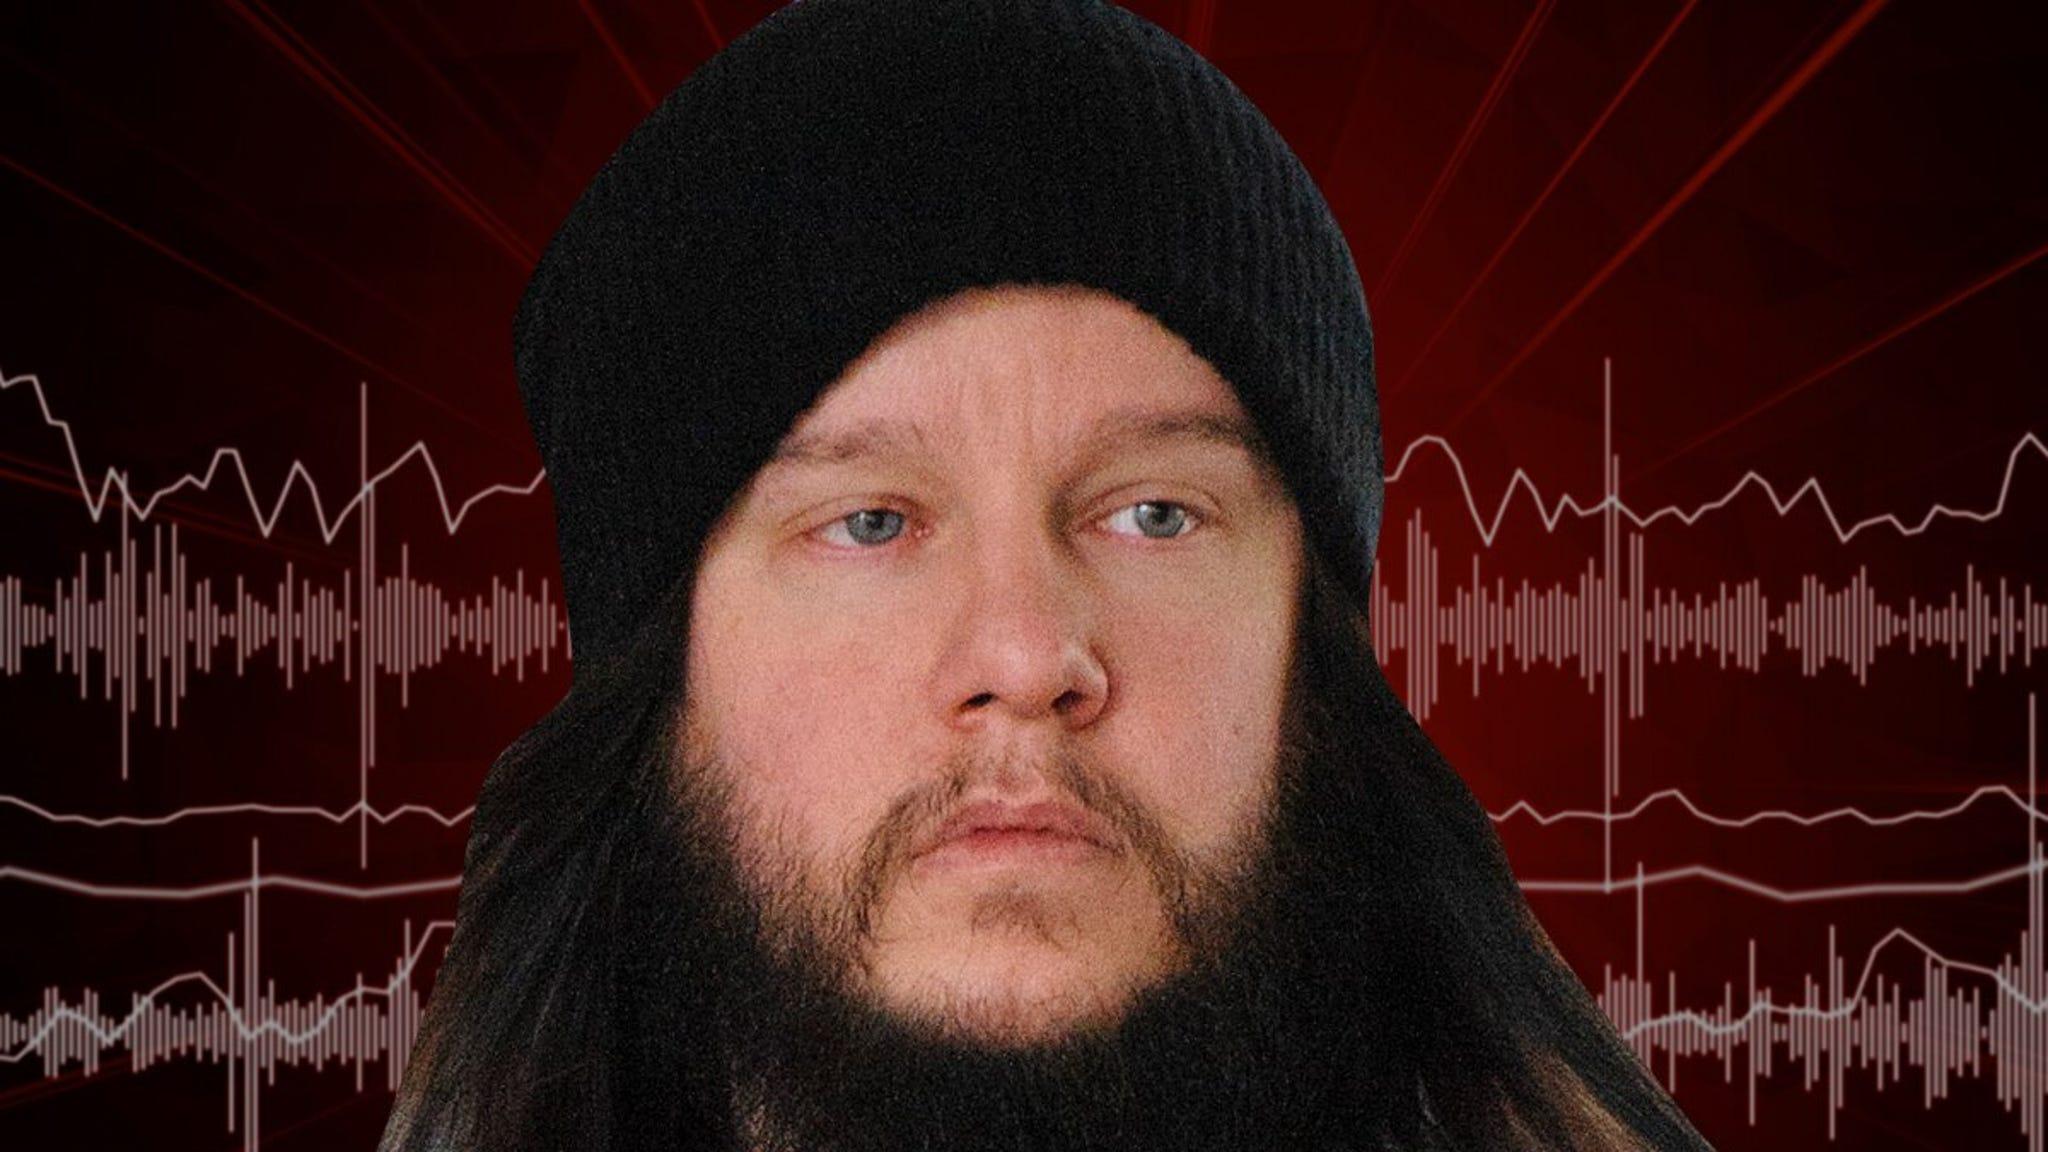 Former Slipknot Drummer Joey Jordison Death, Emotional 911 Call thumbnail